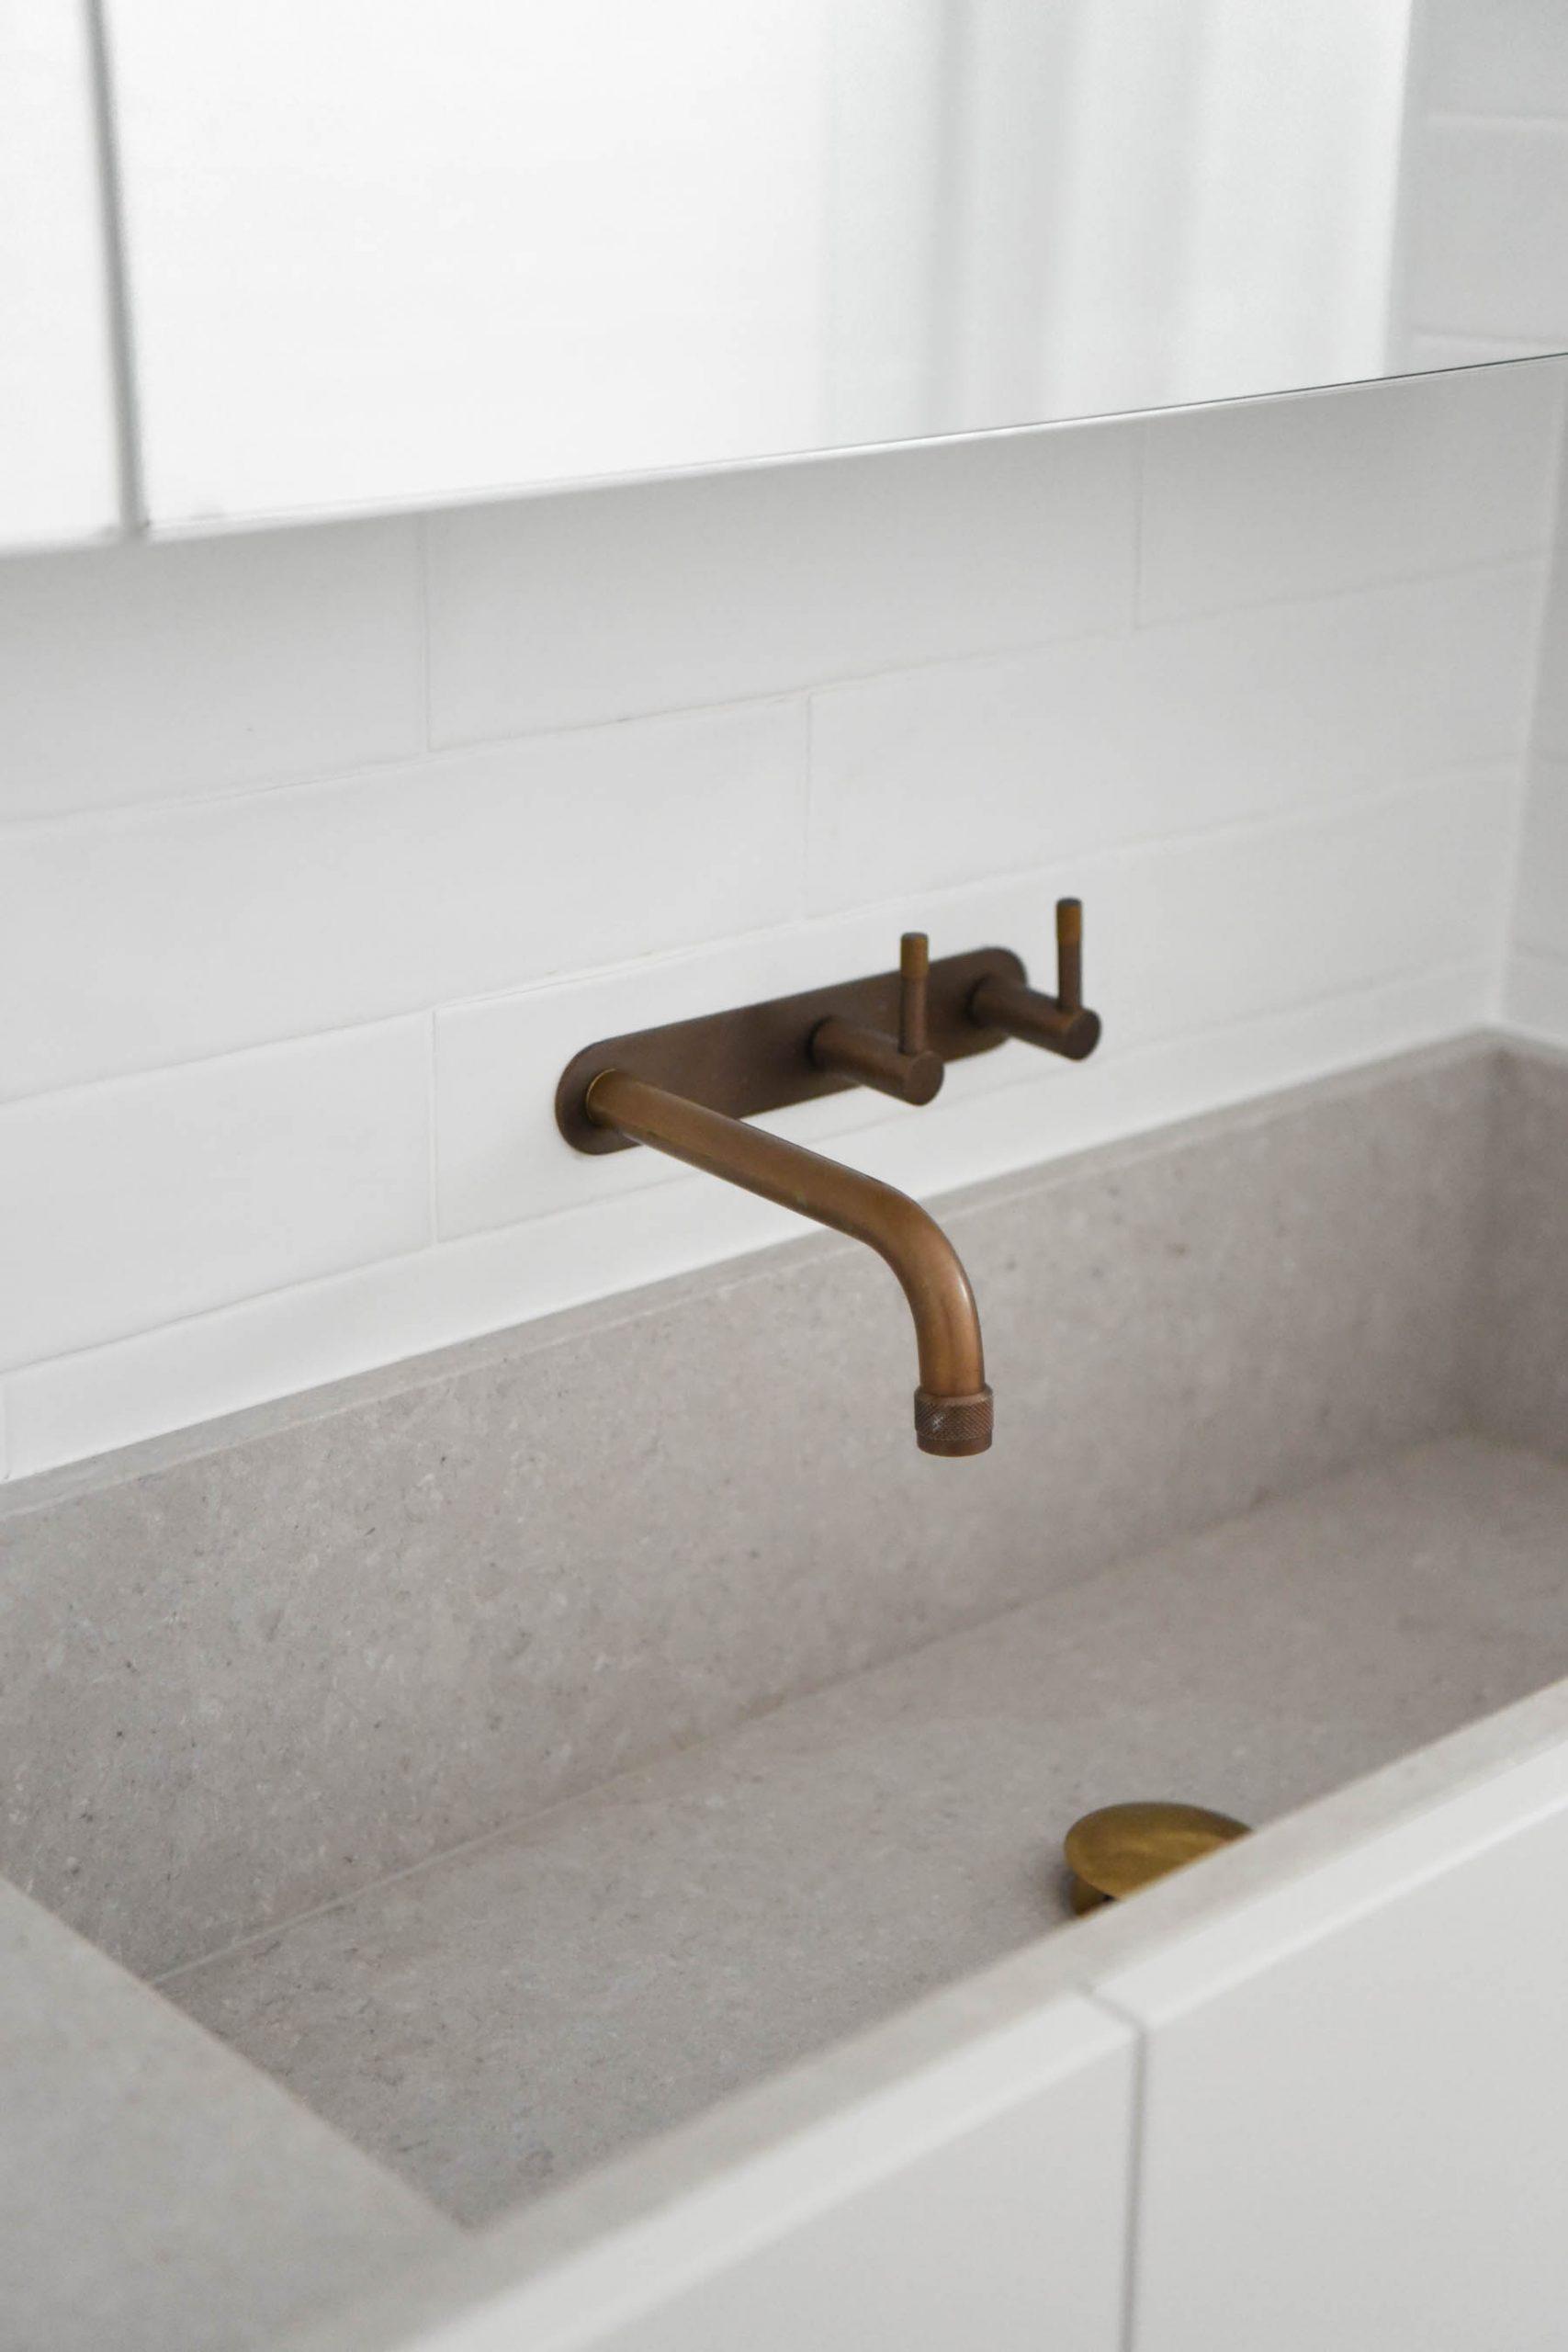 Minimalist bathroom vanity by GatherStudio